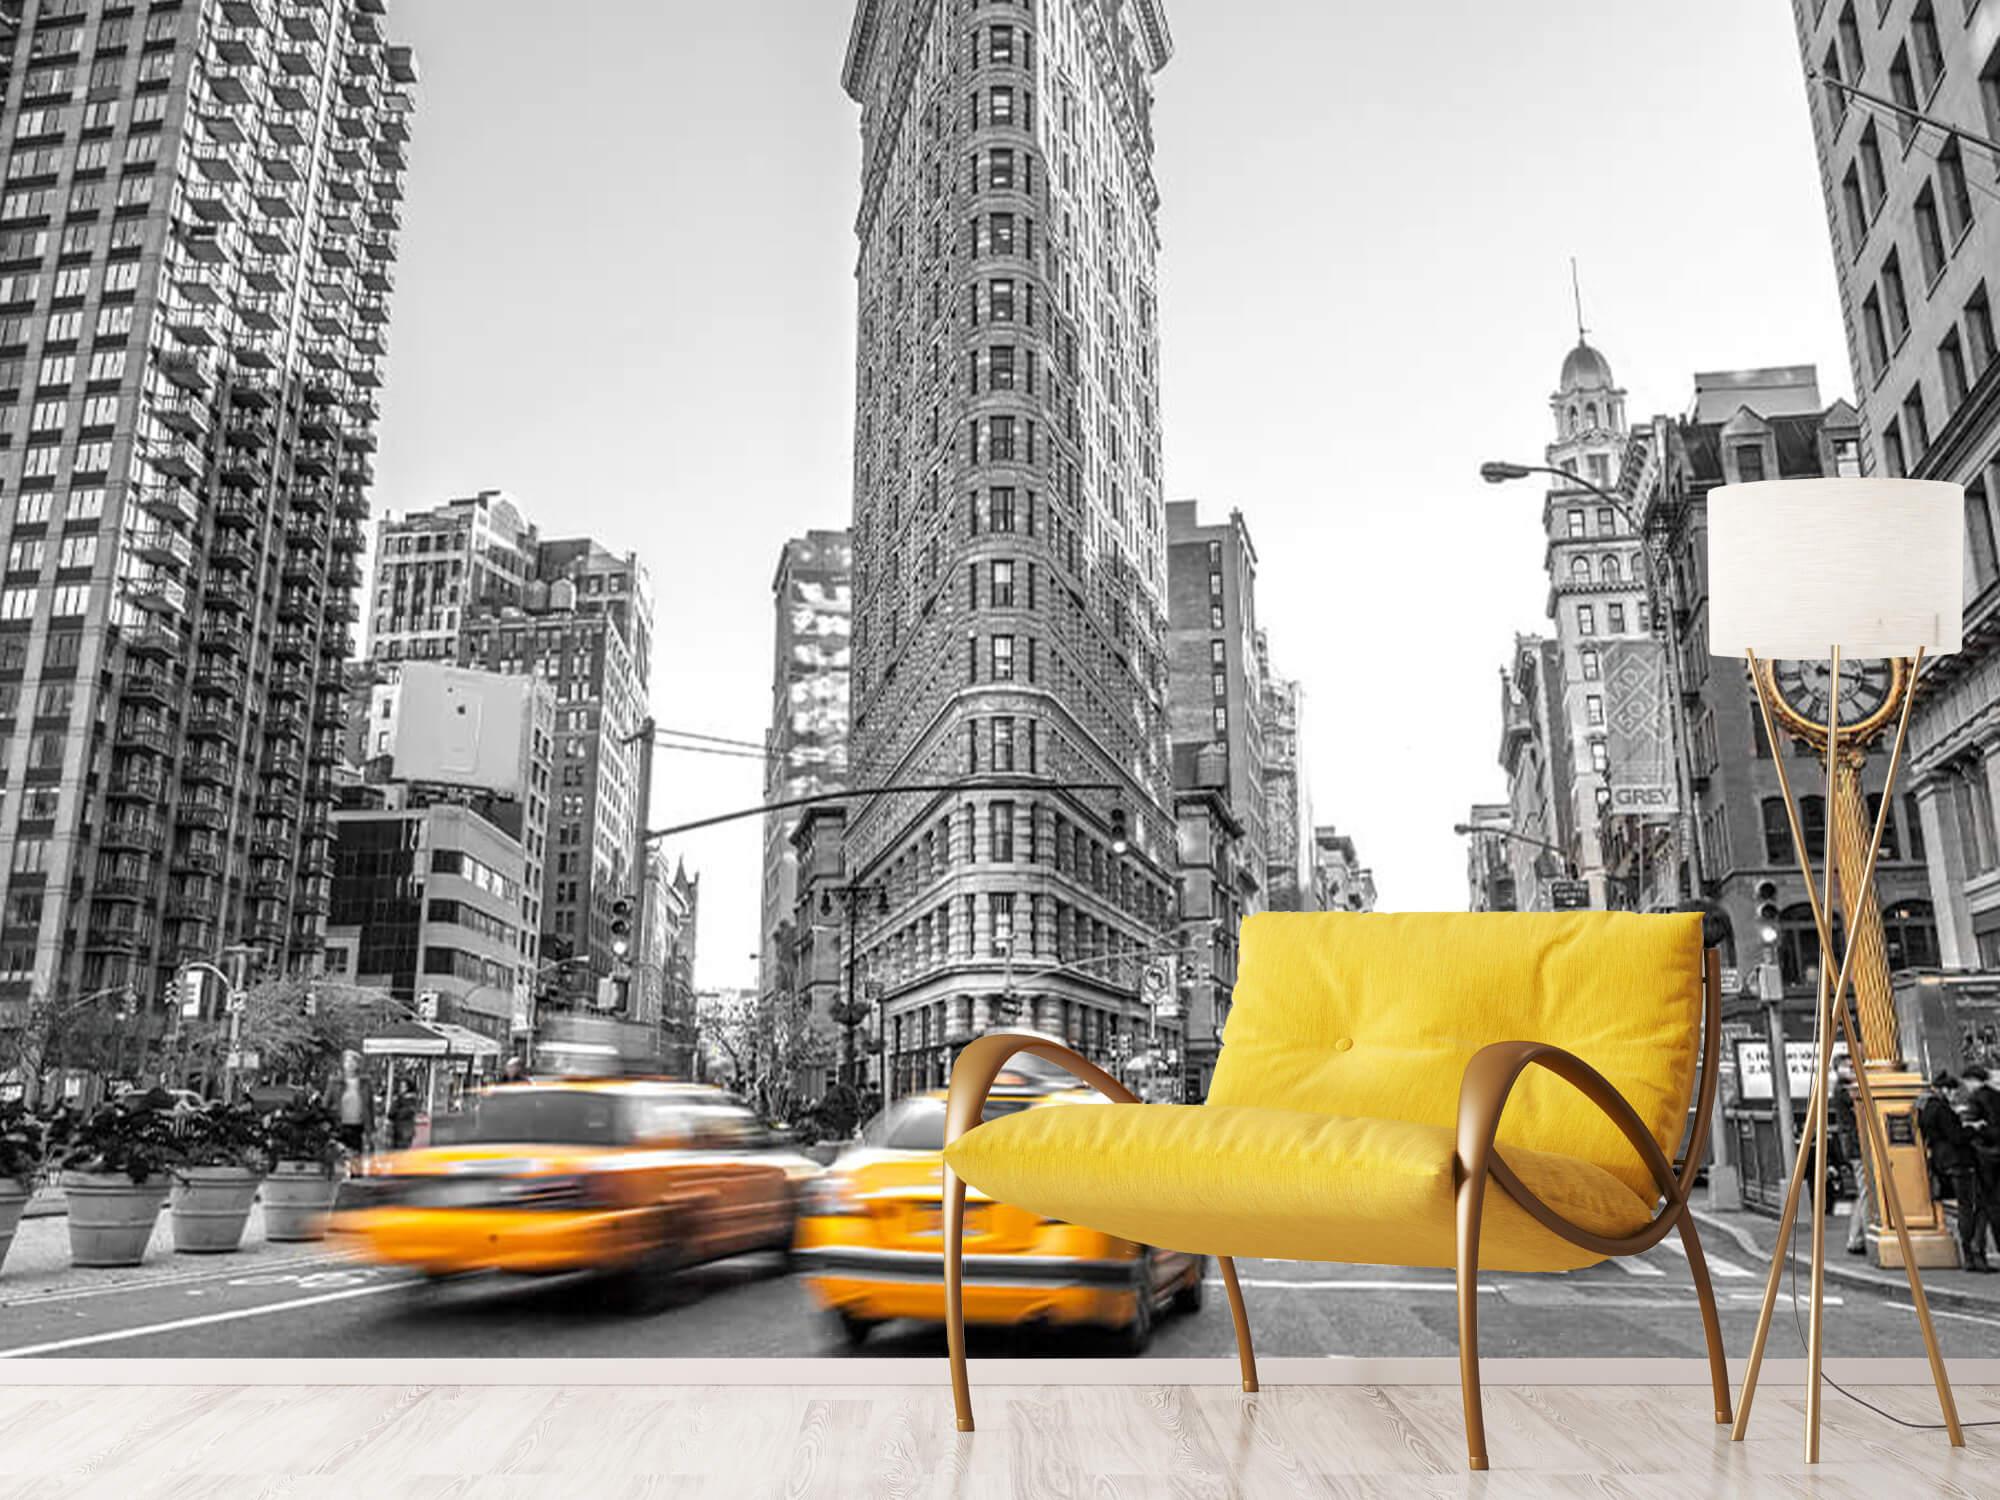 Busy street in New York 13